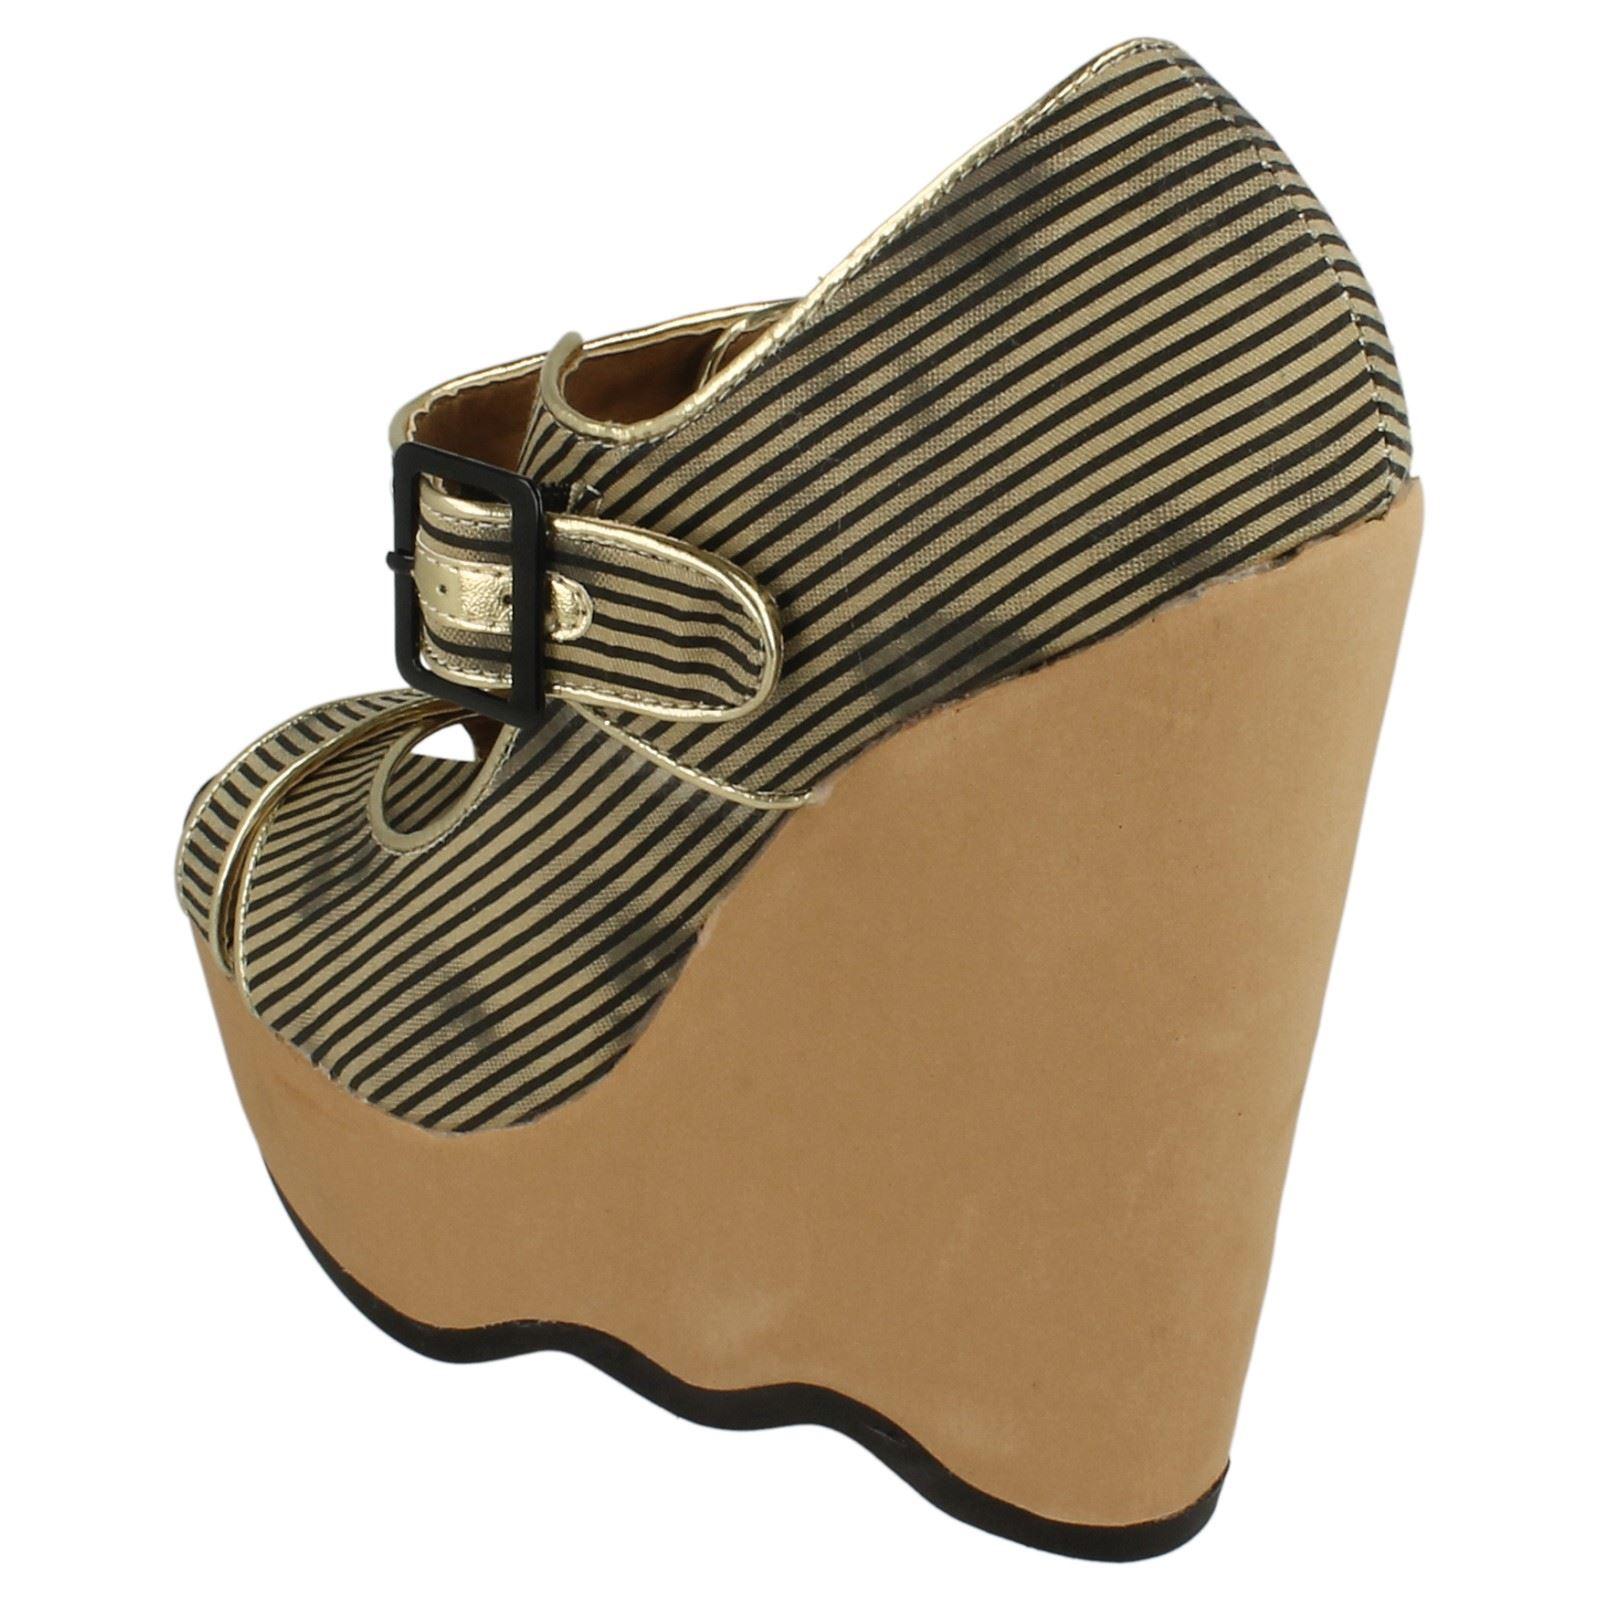 Femmes Spot on Haute Plate-forme Bout Ouvert Sandales